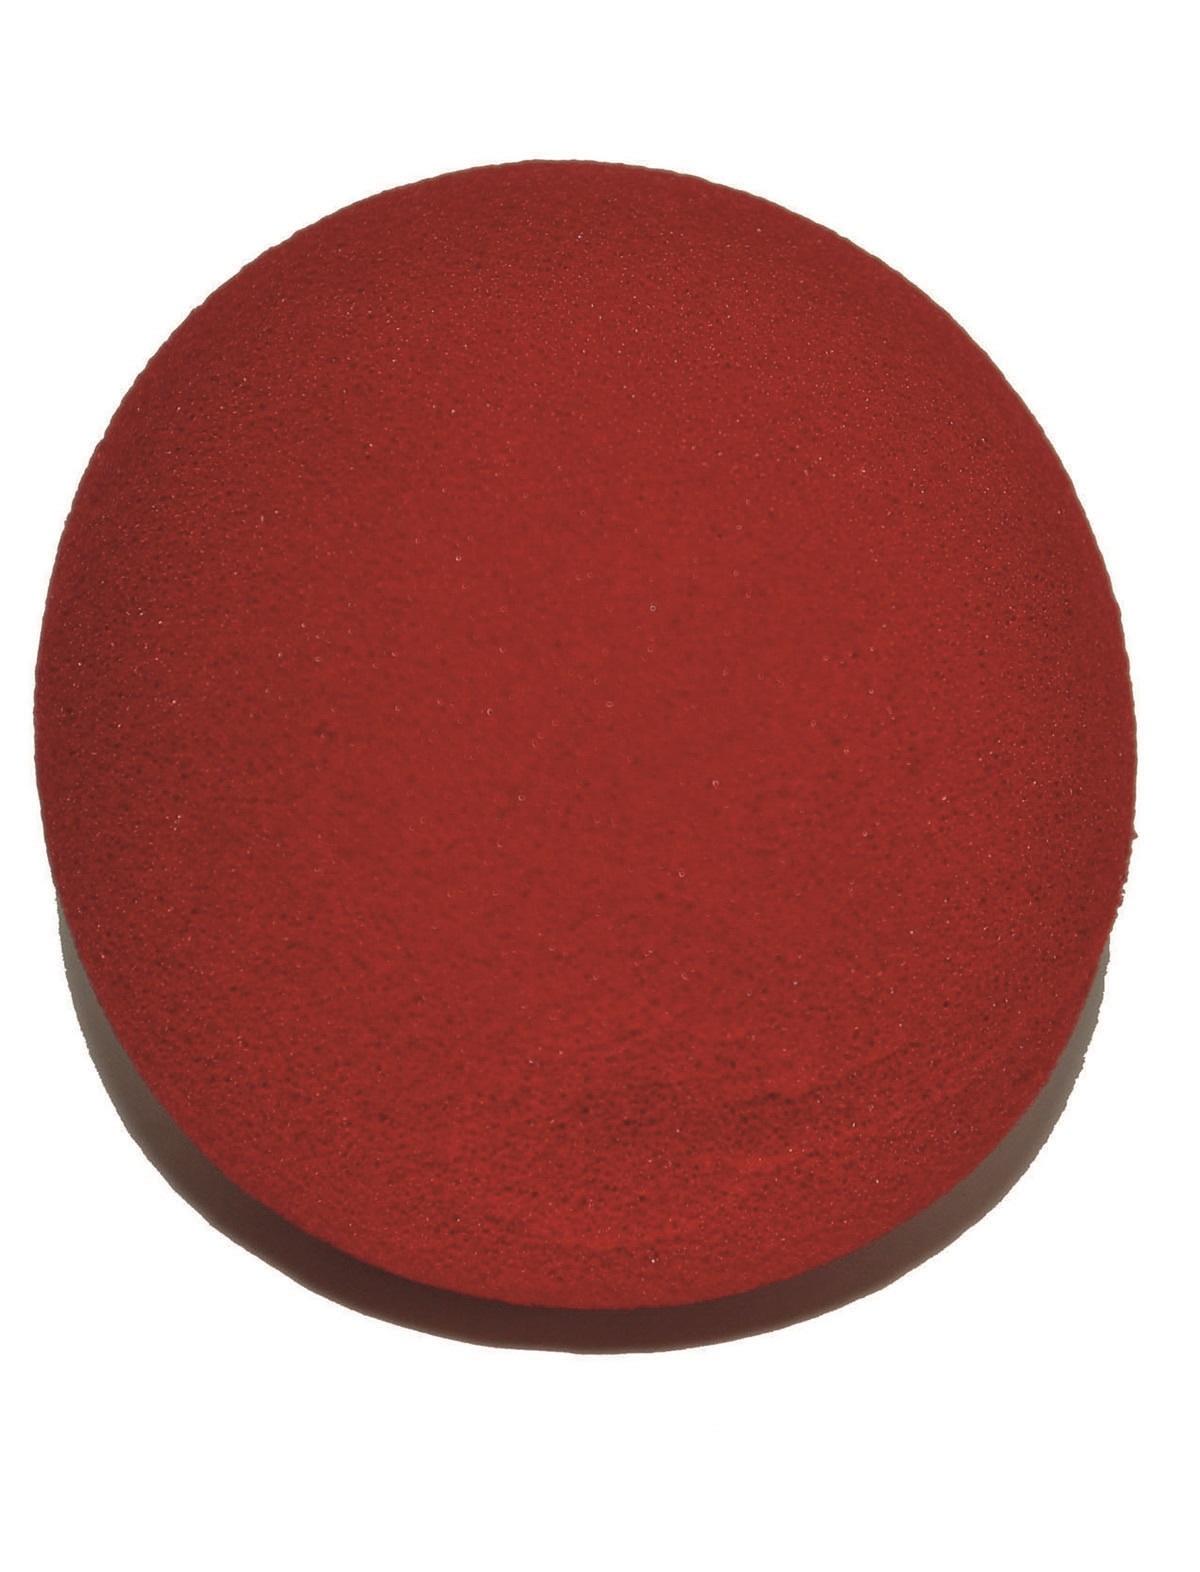 Schaumstoffnase rot 7cm